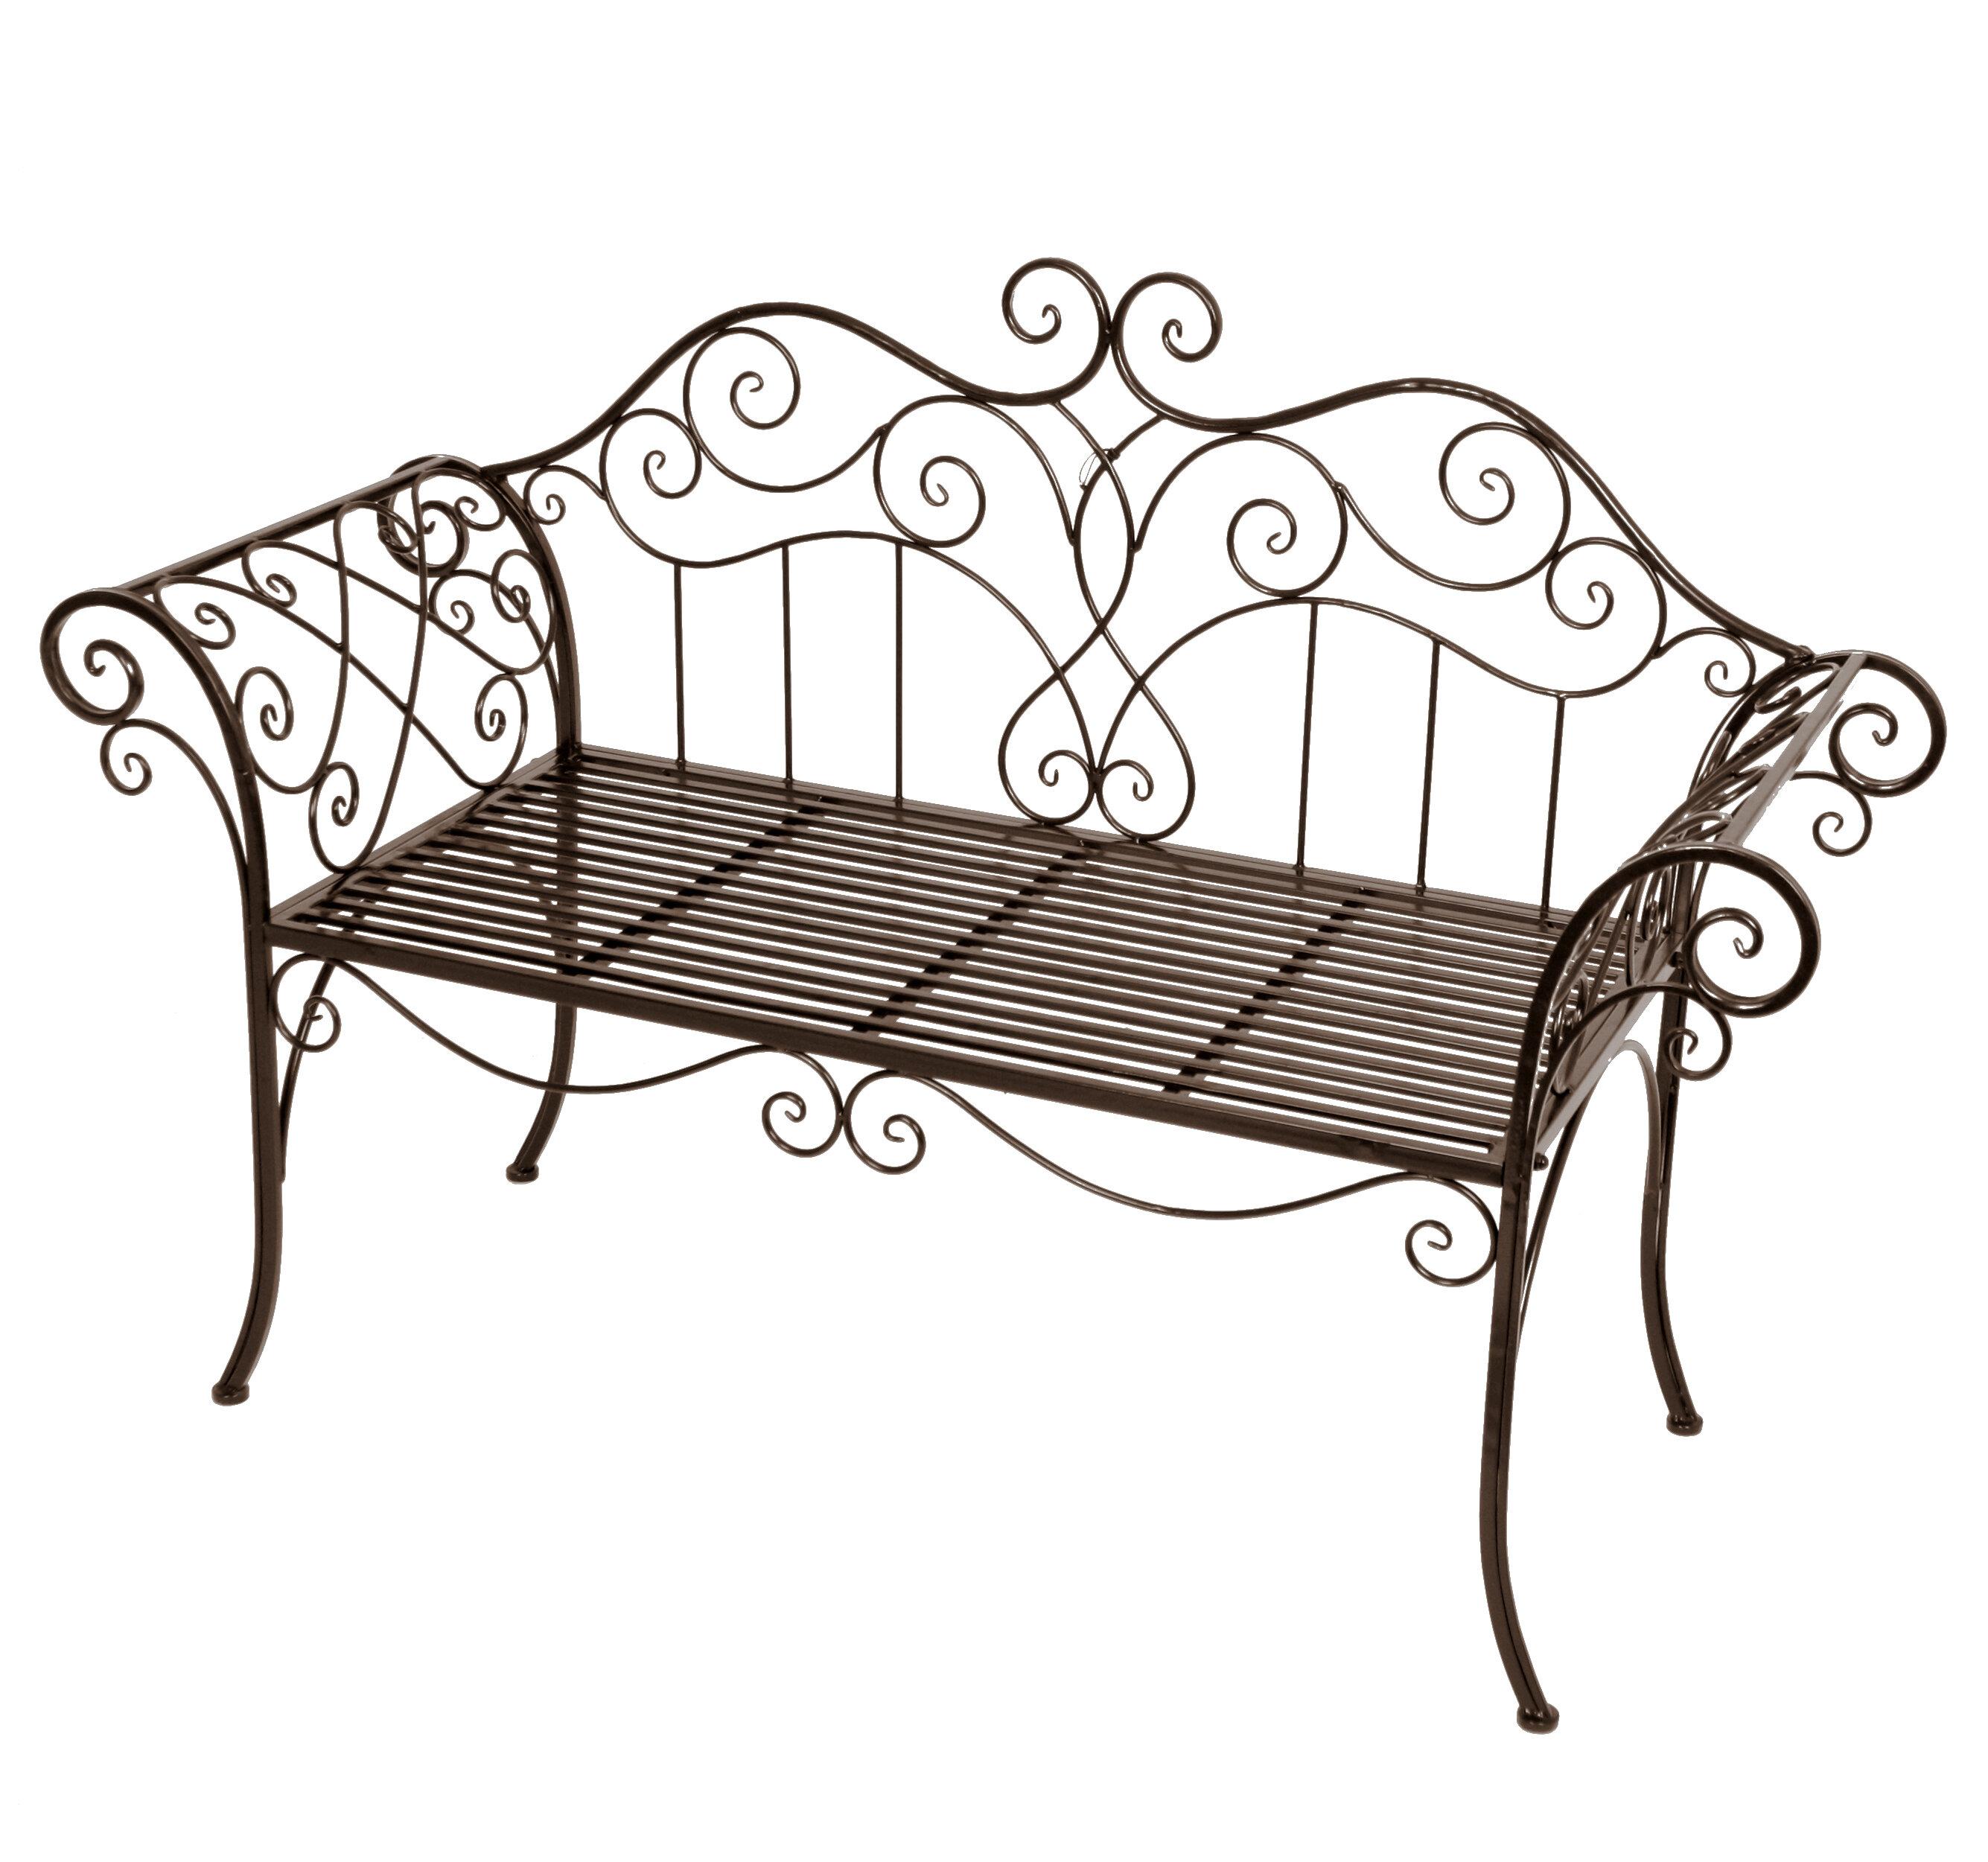 Miraculous Viva La France 2 Seater Steel Garden Bench Beatyapartments Chair Design Images Beatyapartmentscom